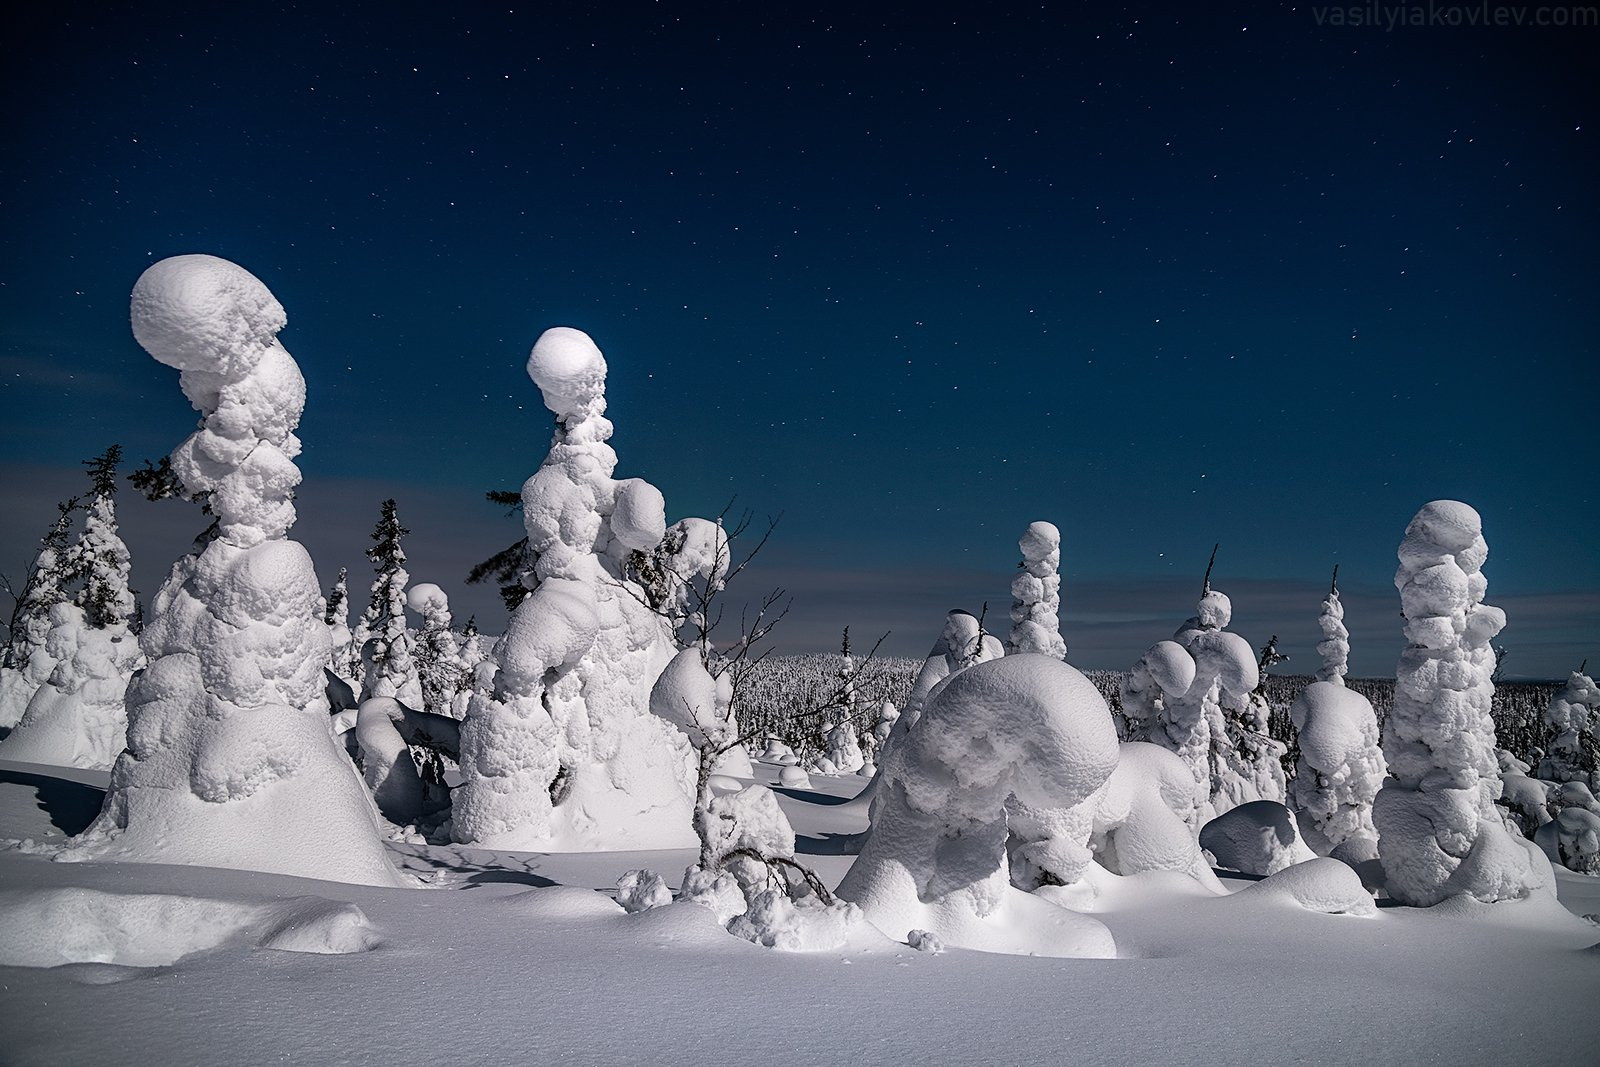 финляндия, лапландия, зима, ночь, Василий Яковлев